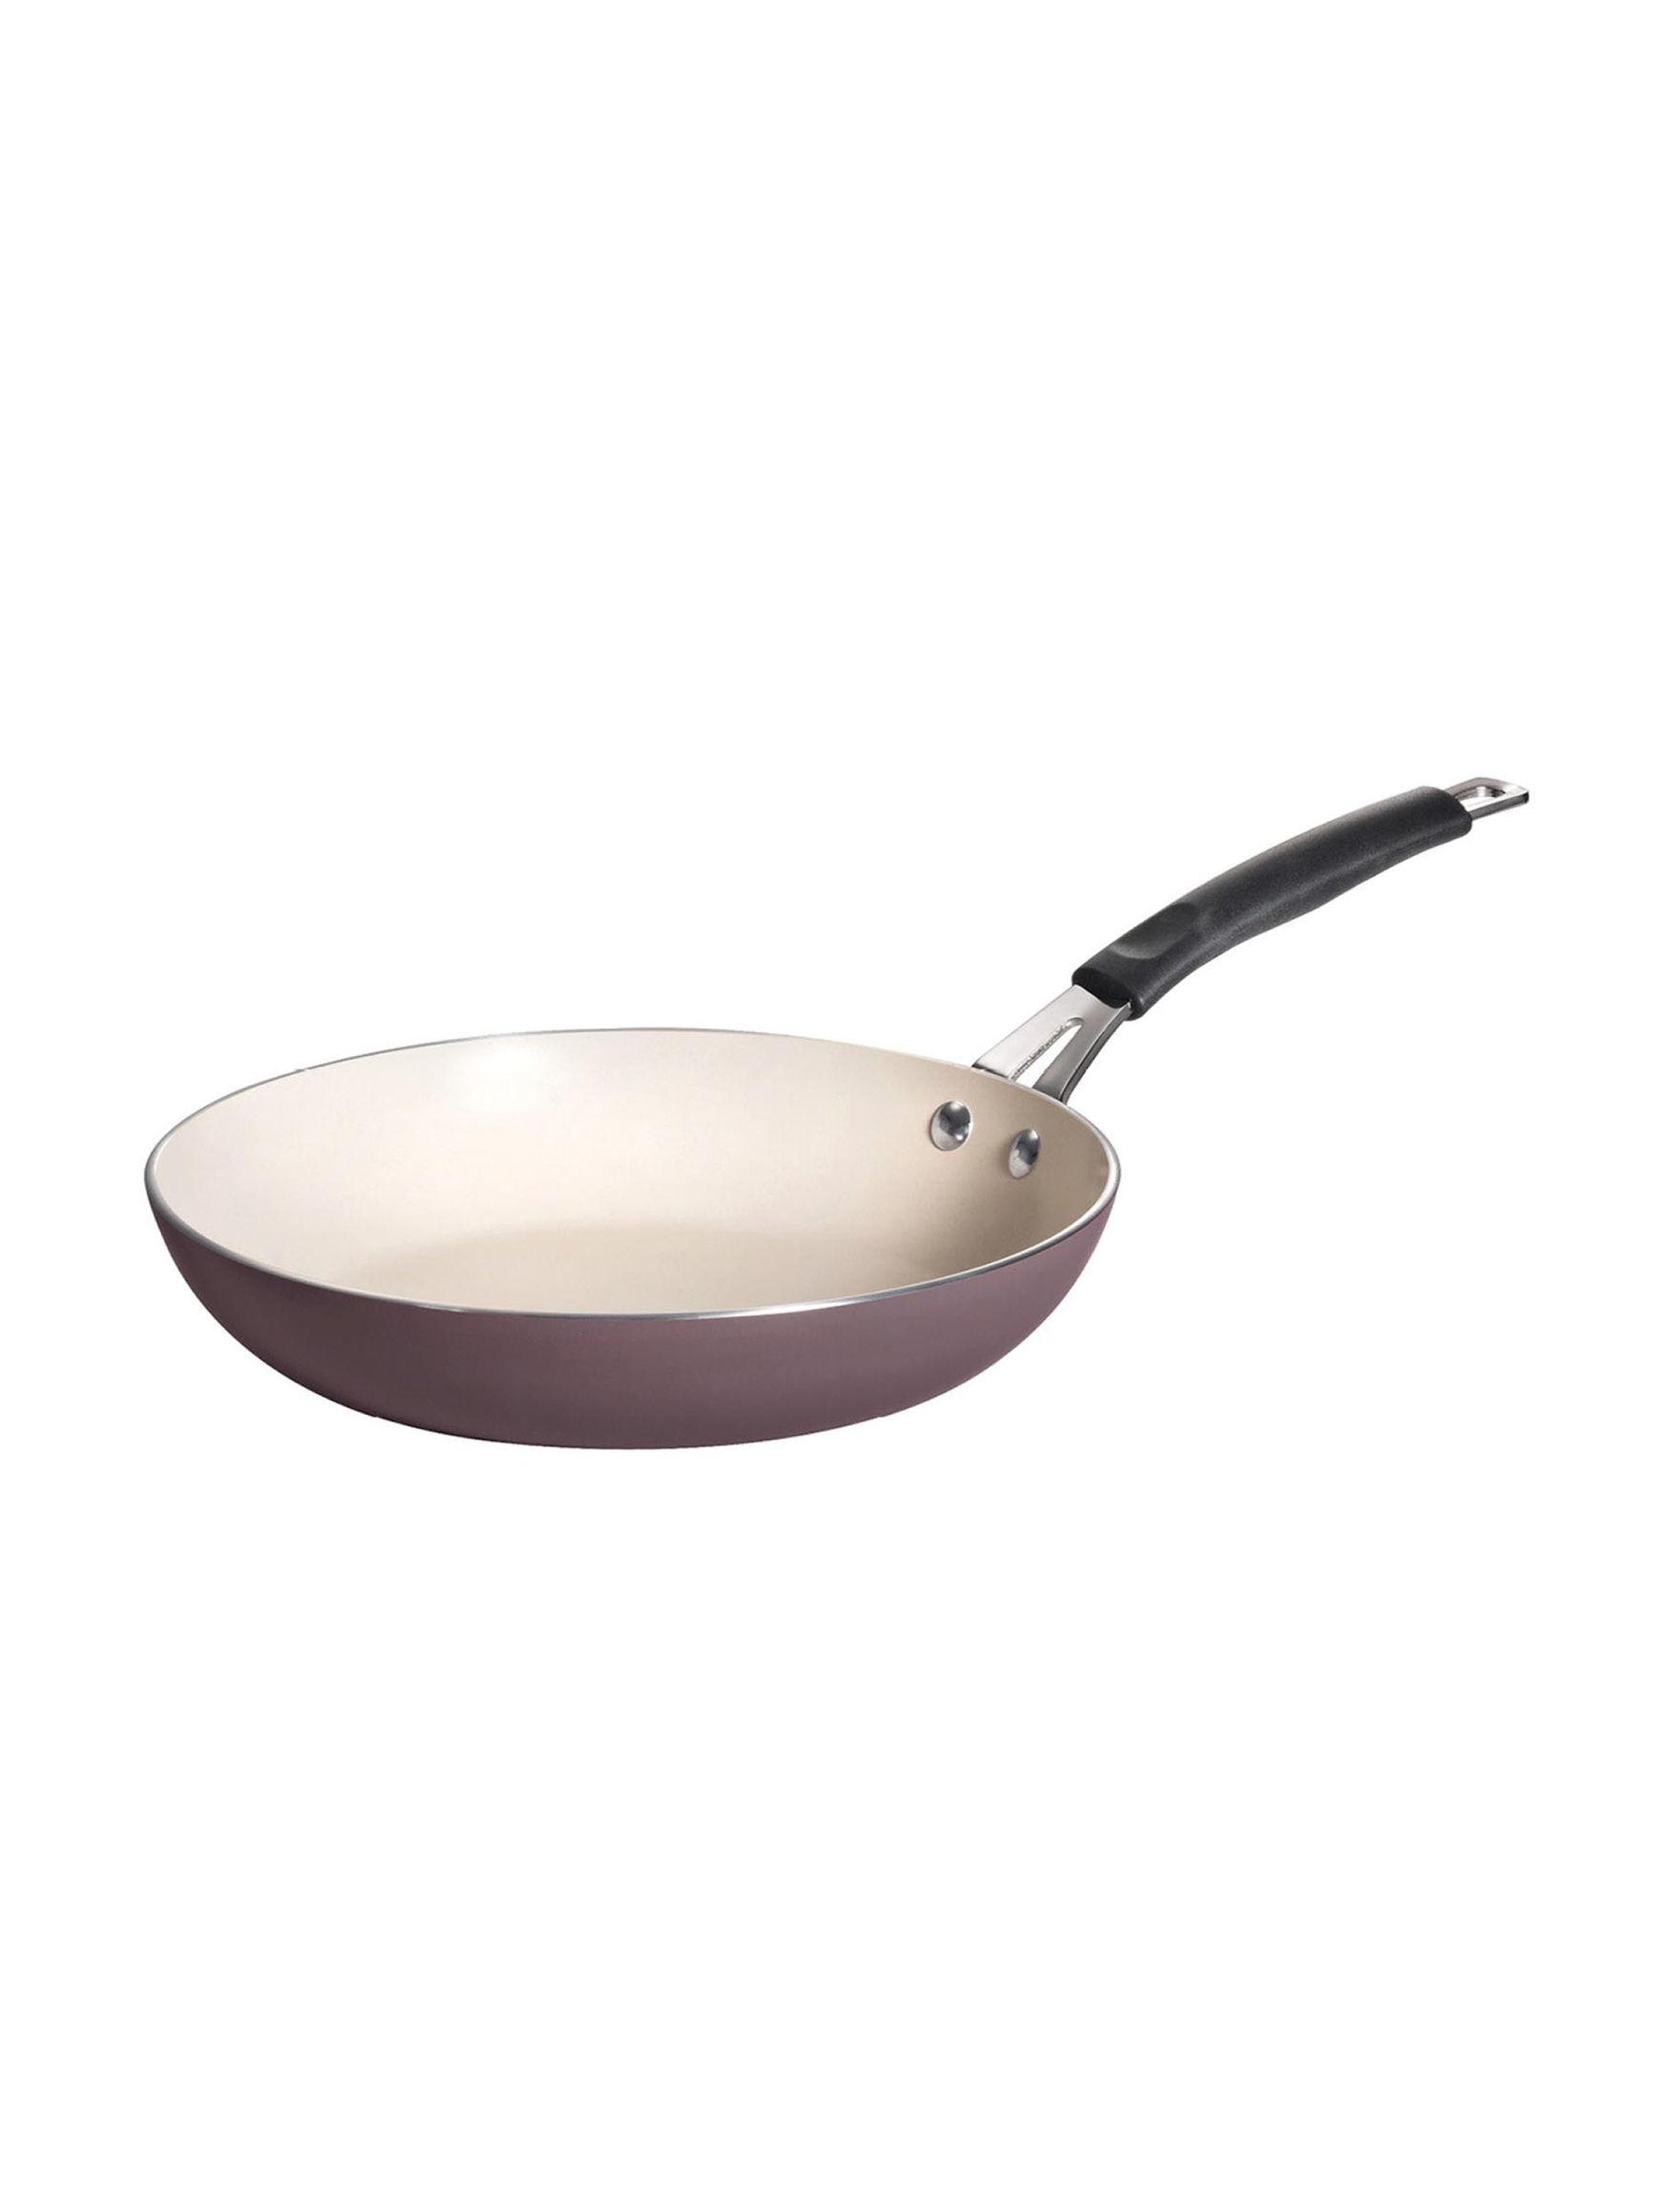 Tramontina Plum Frying Pans & Skillets Cookware